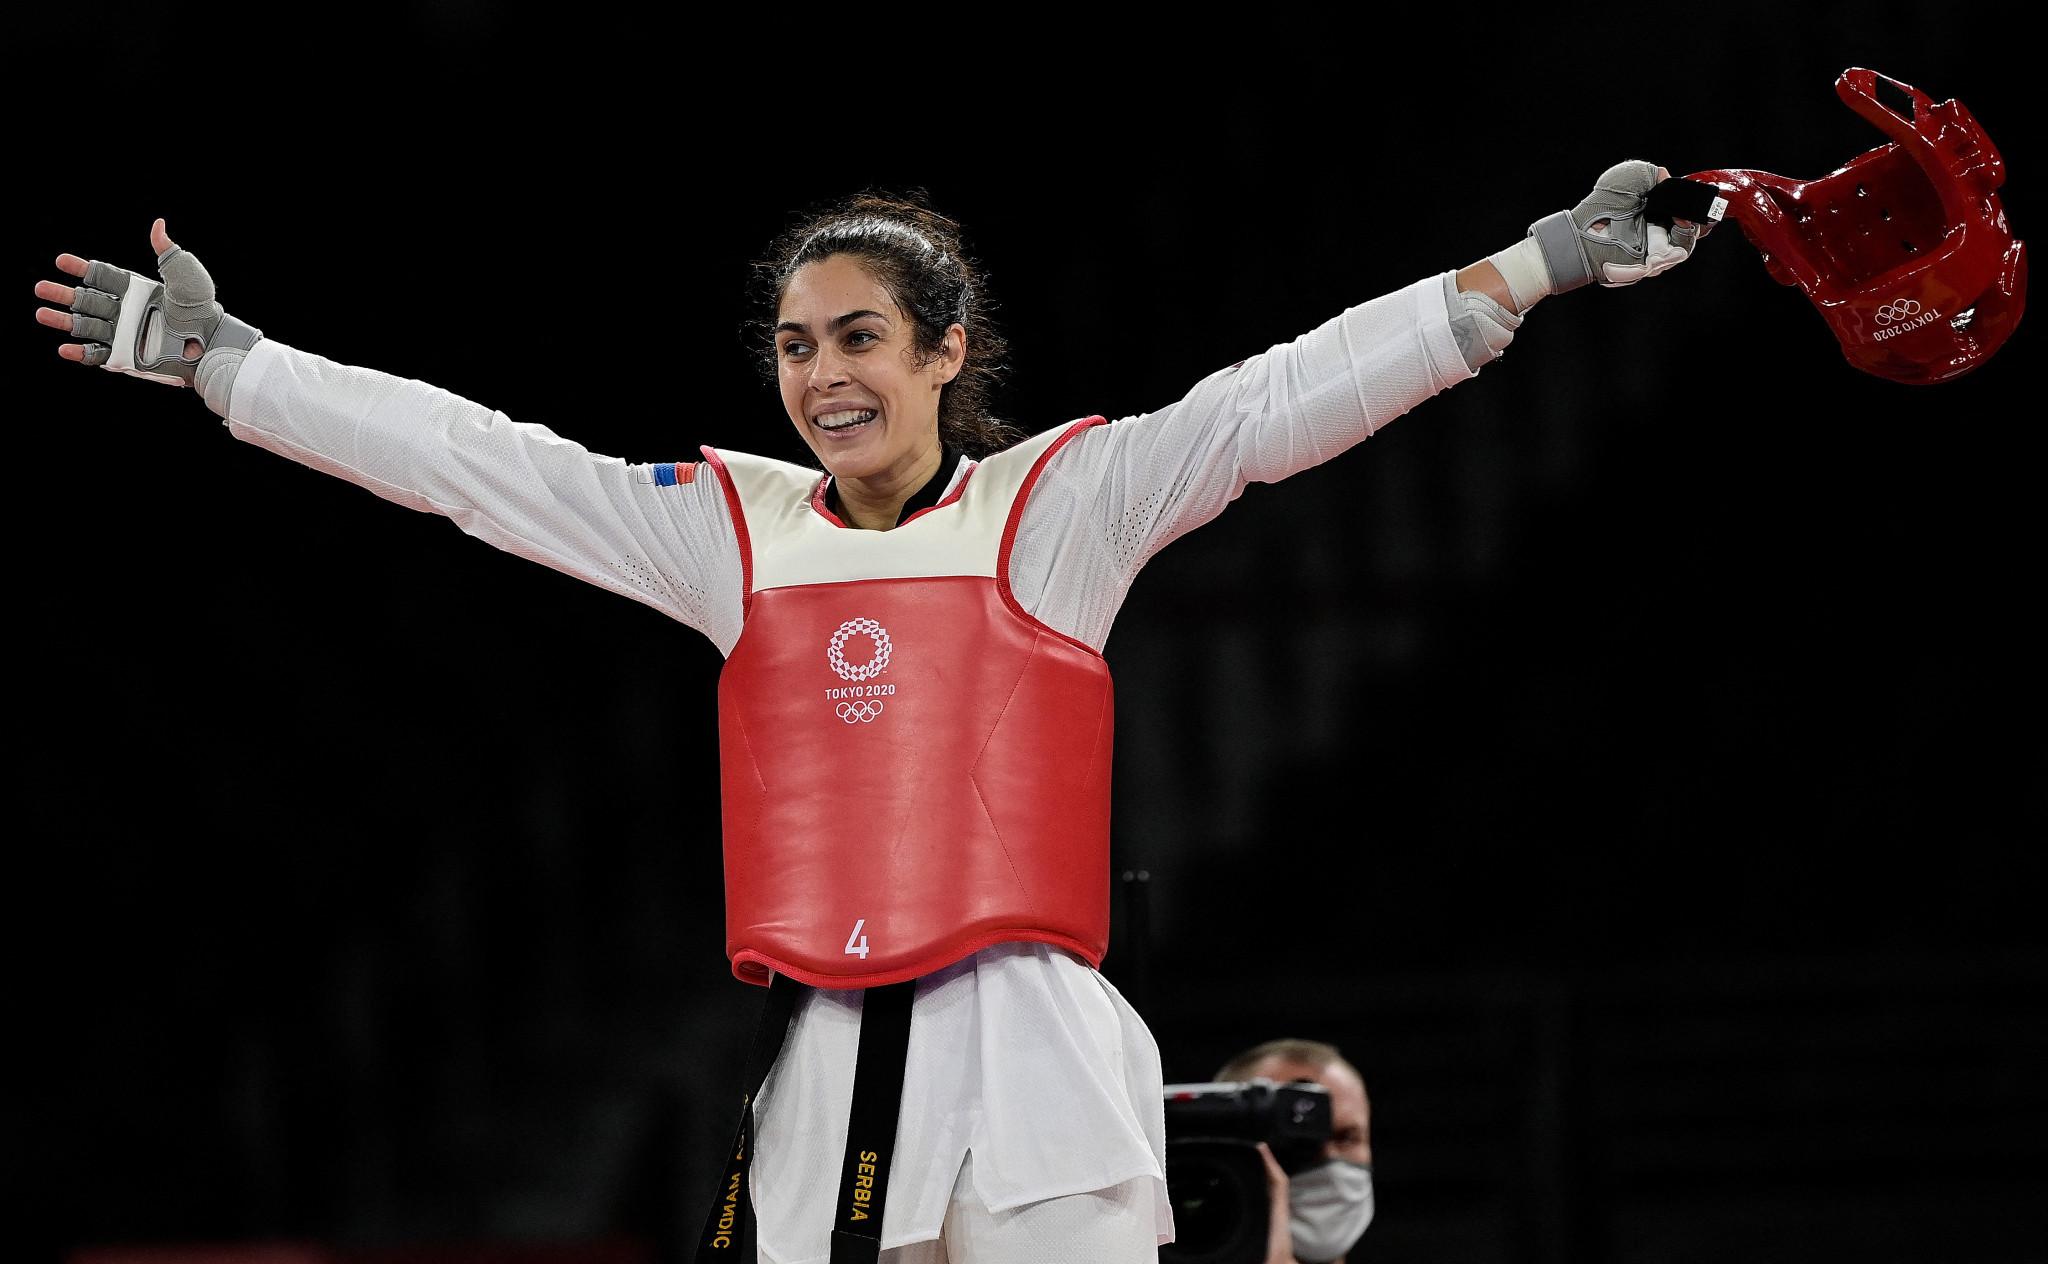 Serbia's Mandić reclaims Olympic gold as ROC enjoy more taekwondo success